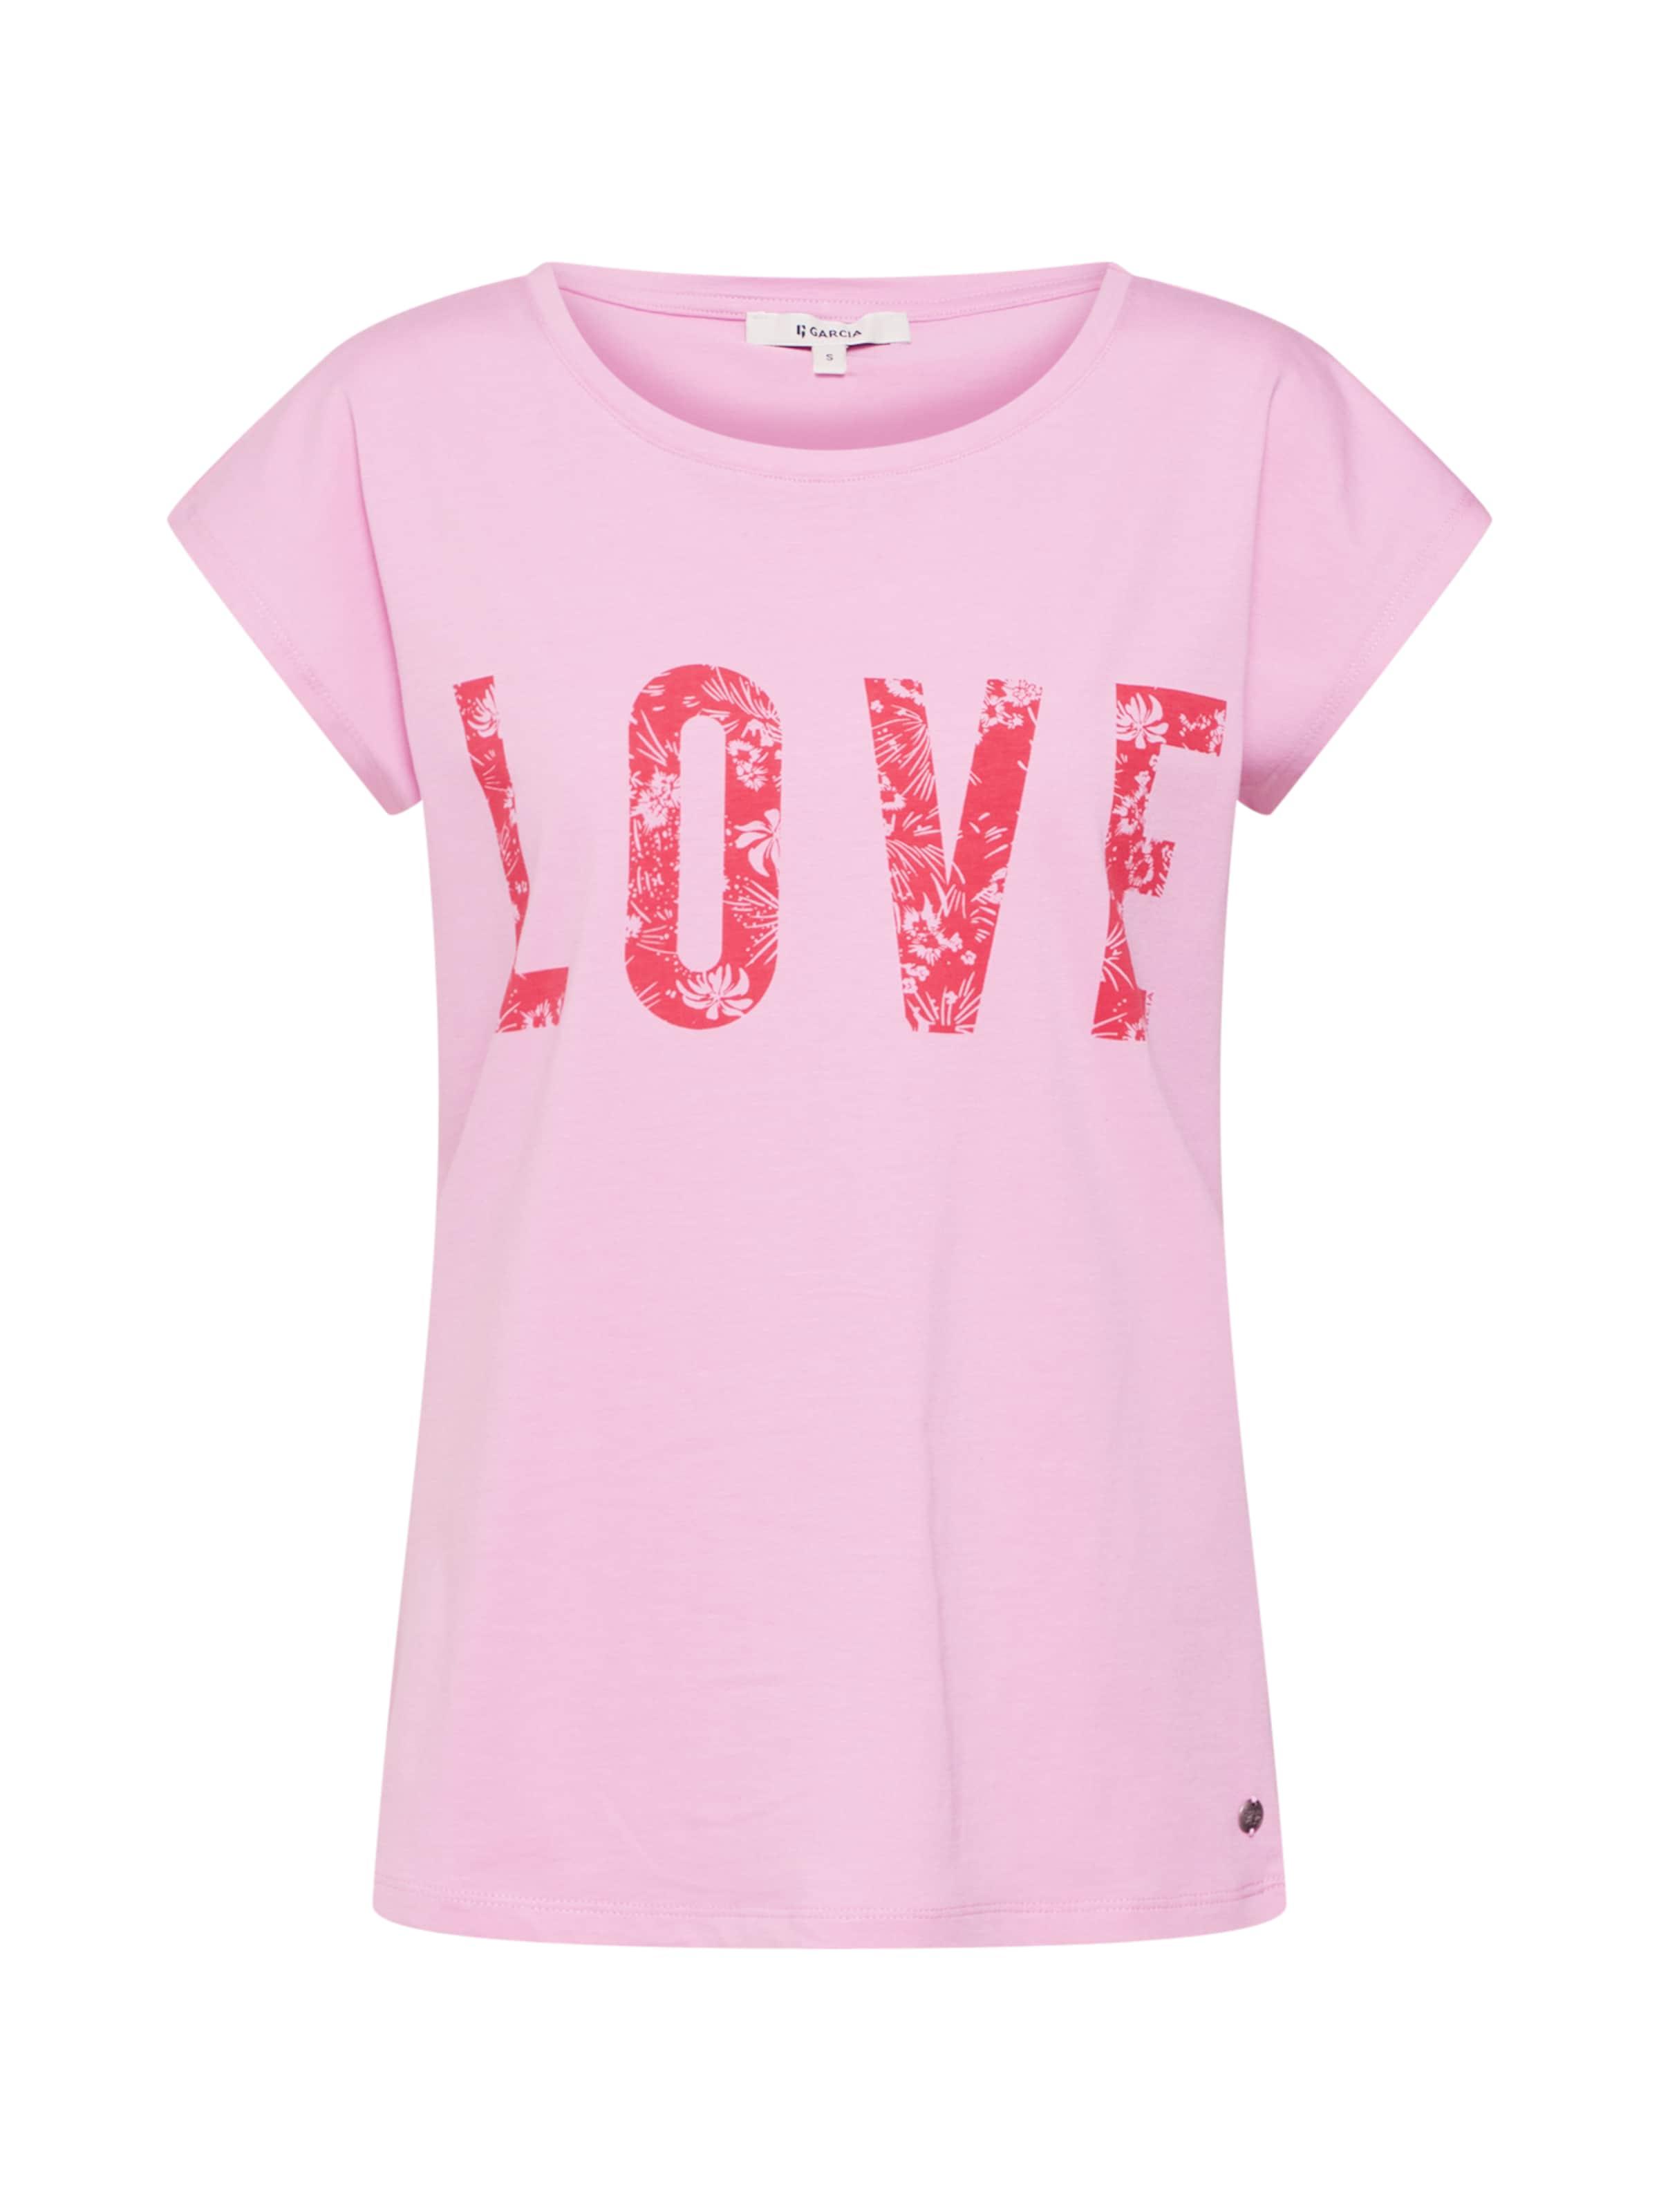 Garcia Garcia En T shirt T RoseRouge m08vNnw